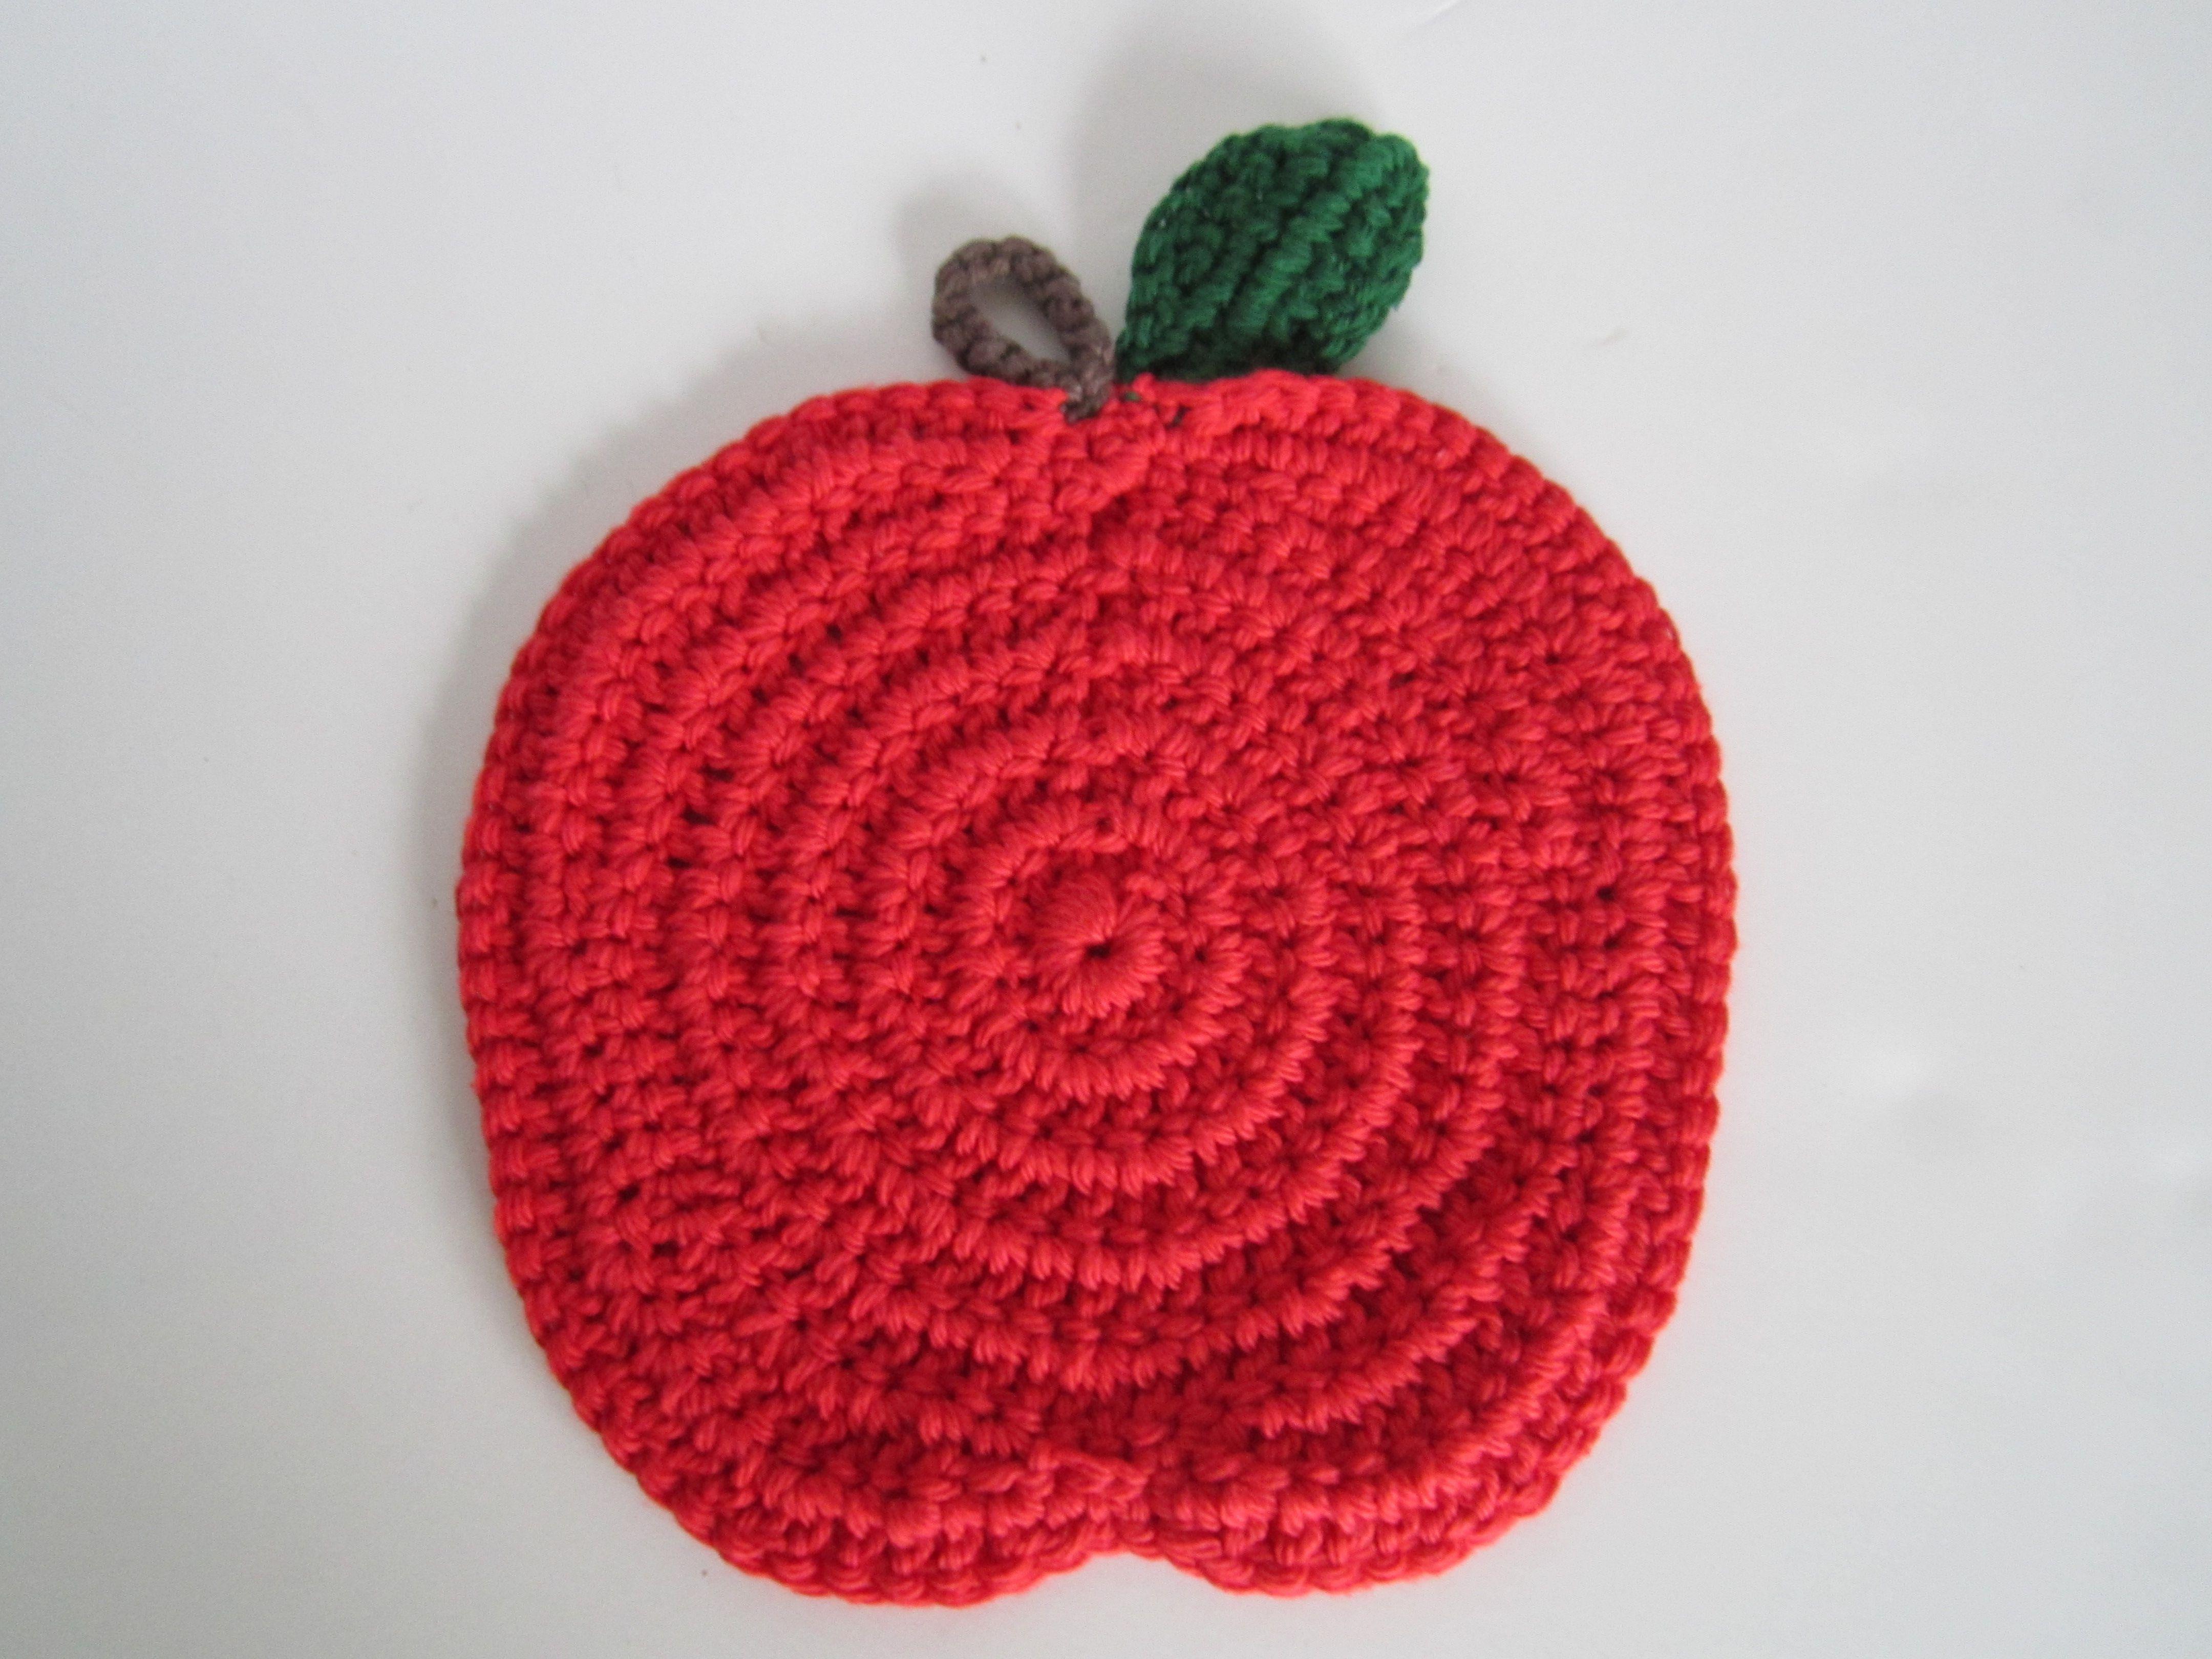 dish food cotton furniture kitchen decoration interior crochet textile beautiful home handmade holiday freeshipping modern apple